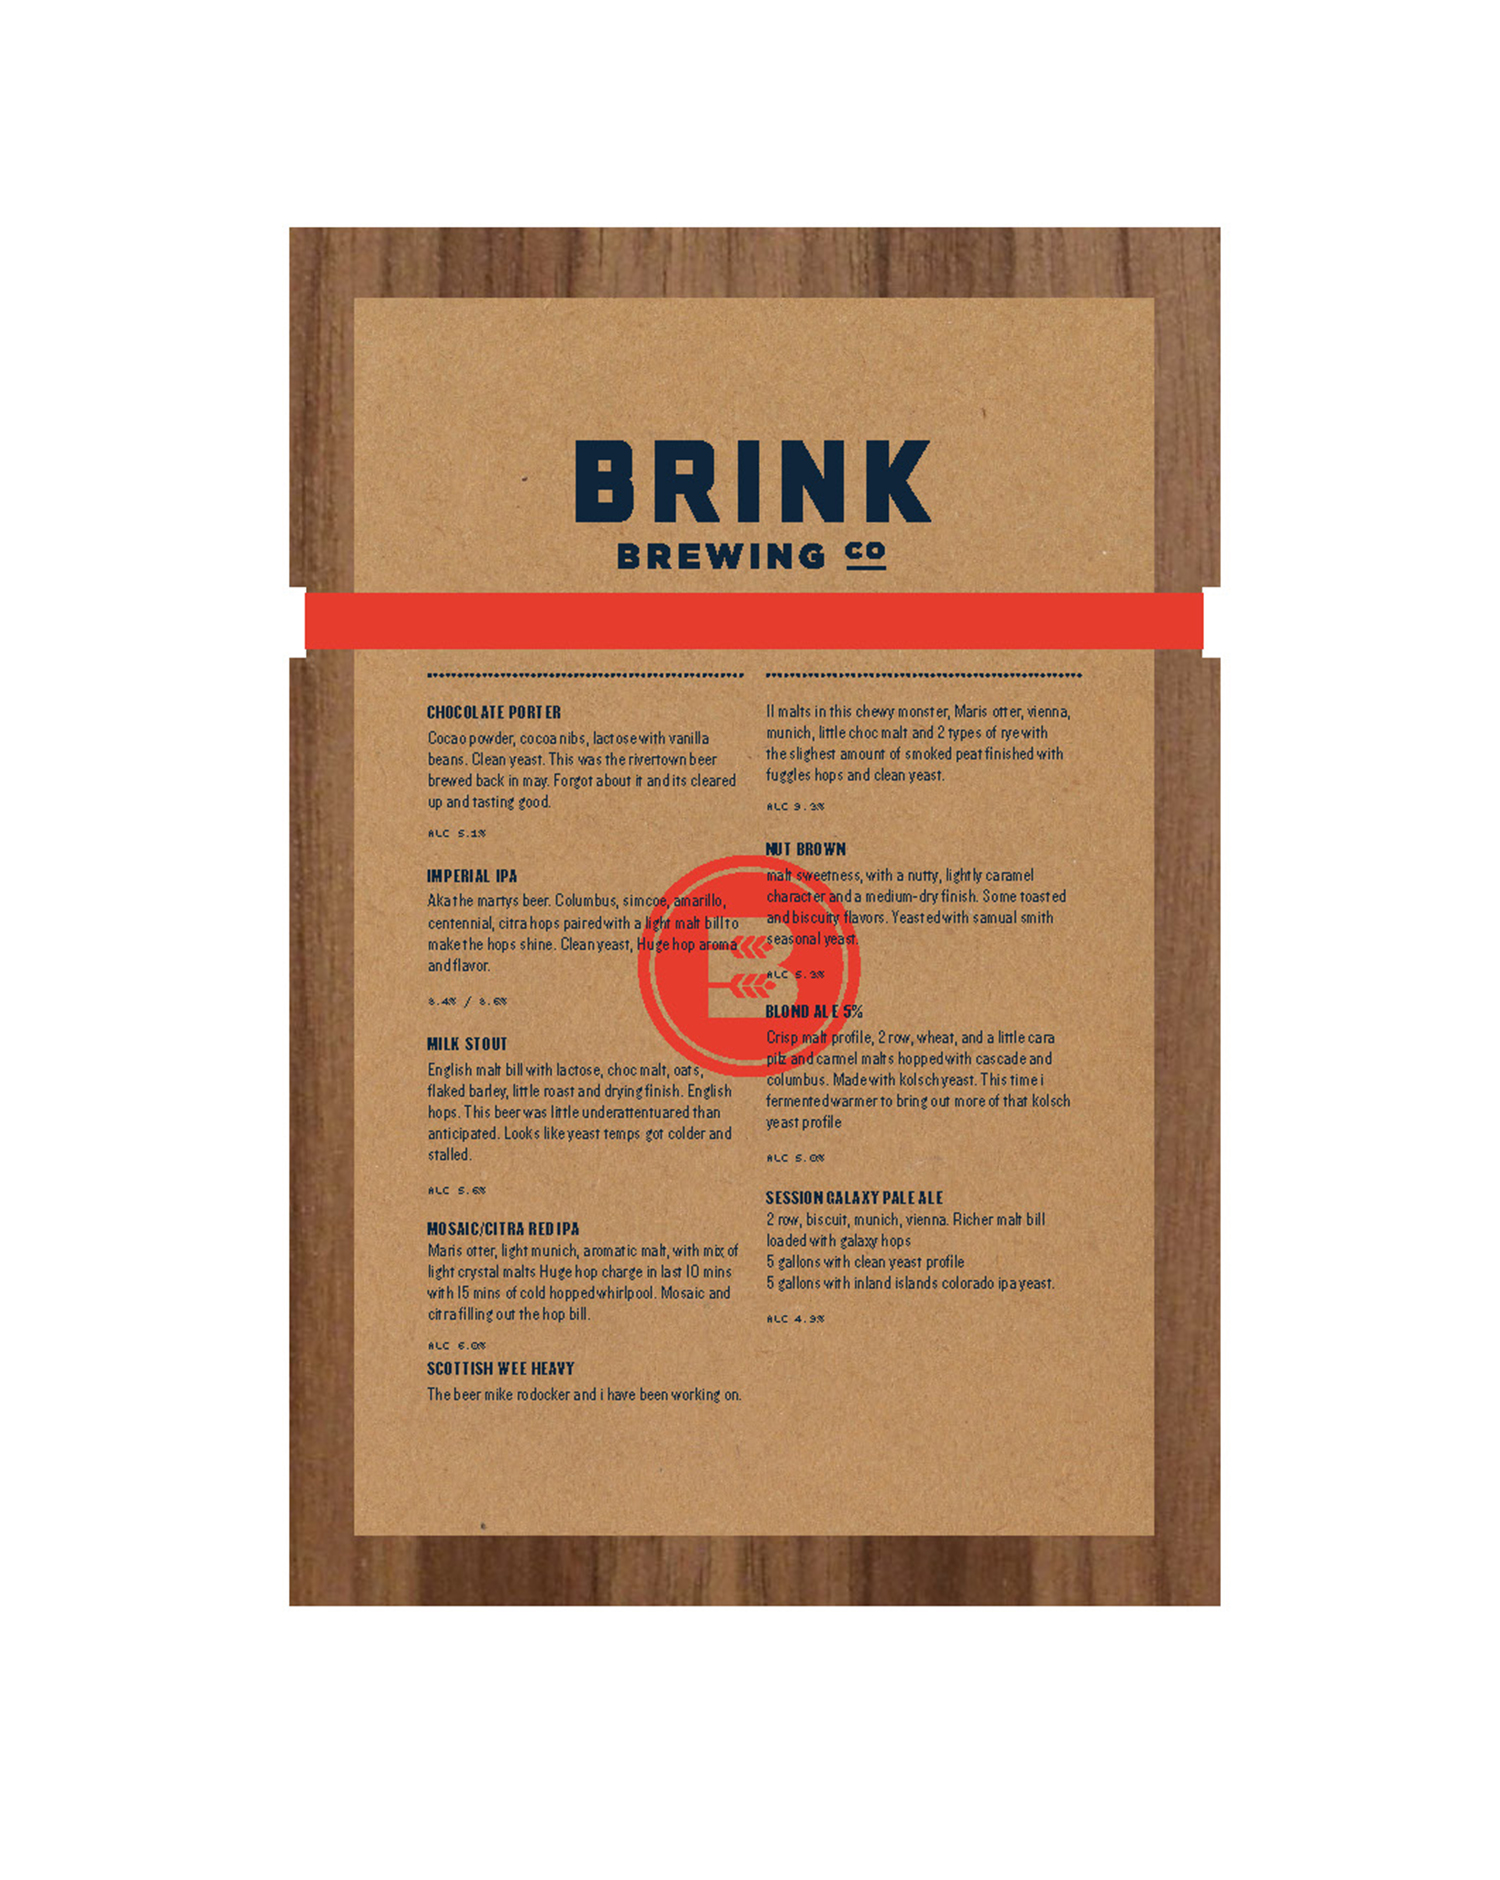 Brink_Menu_WithWood_R1V3 (1)_Page_1.jpg